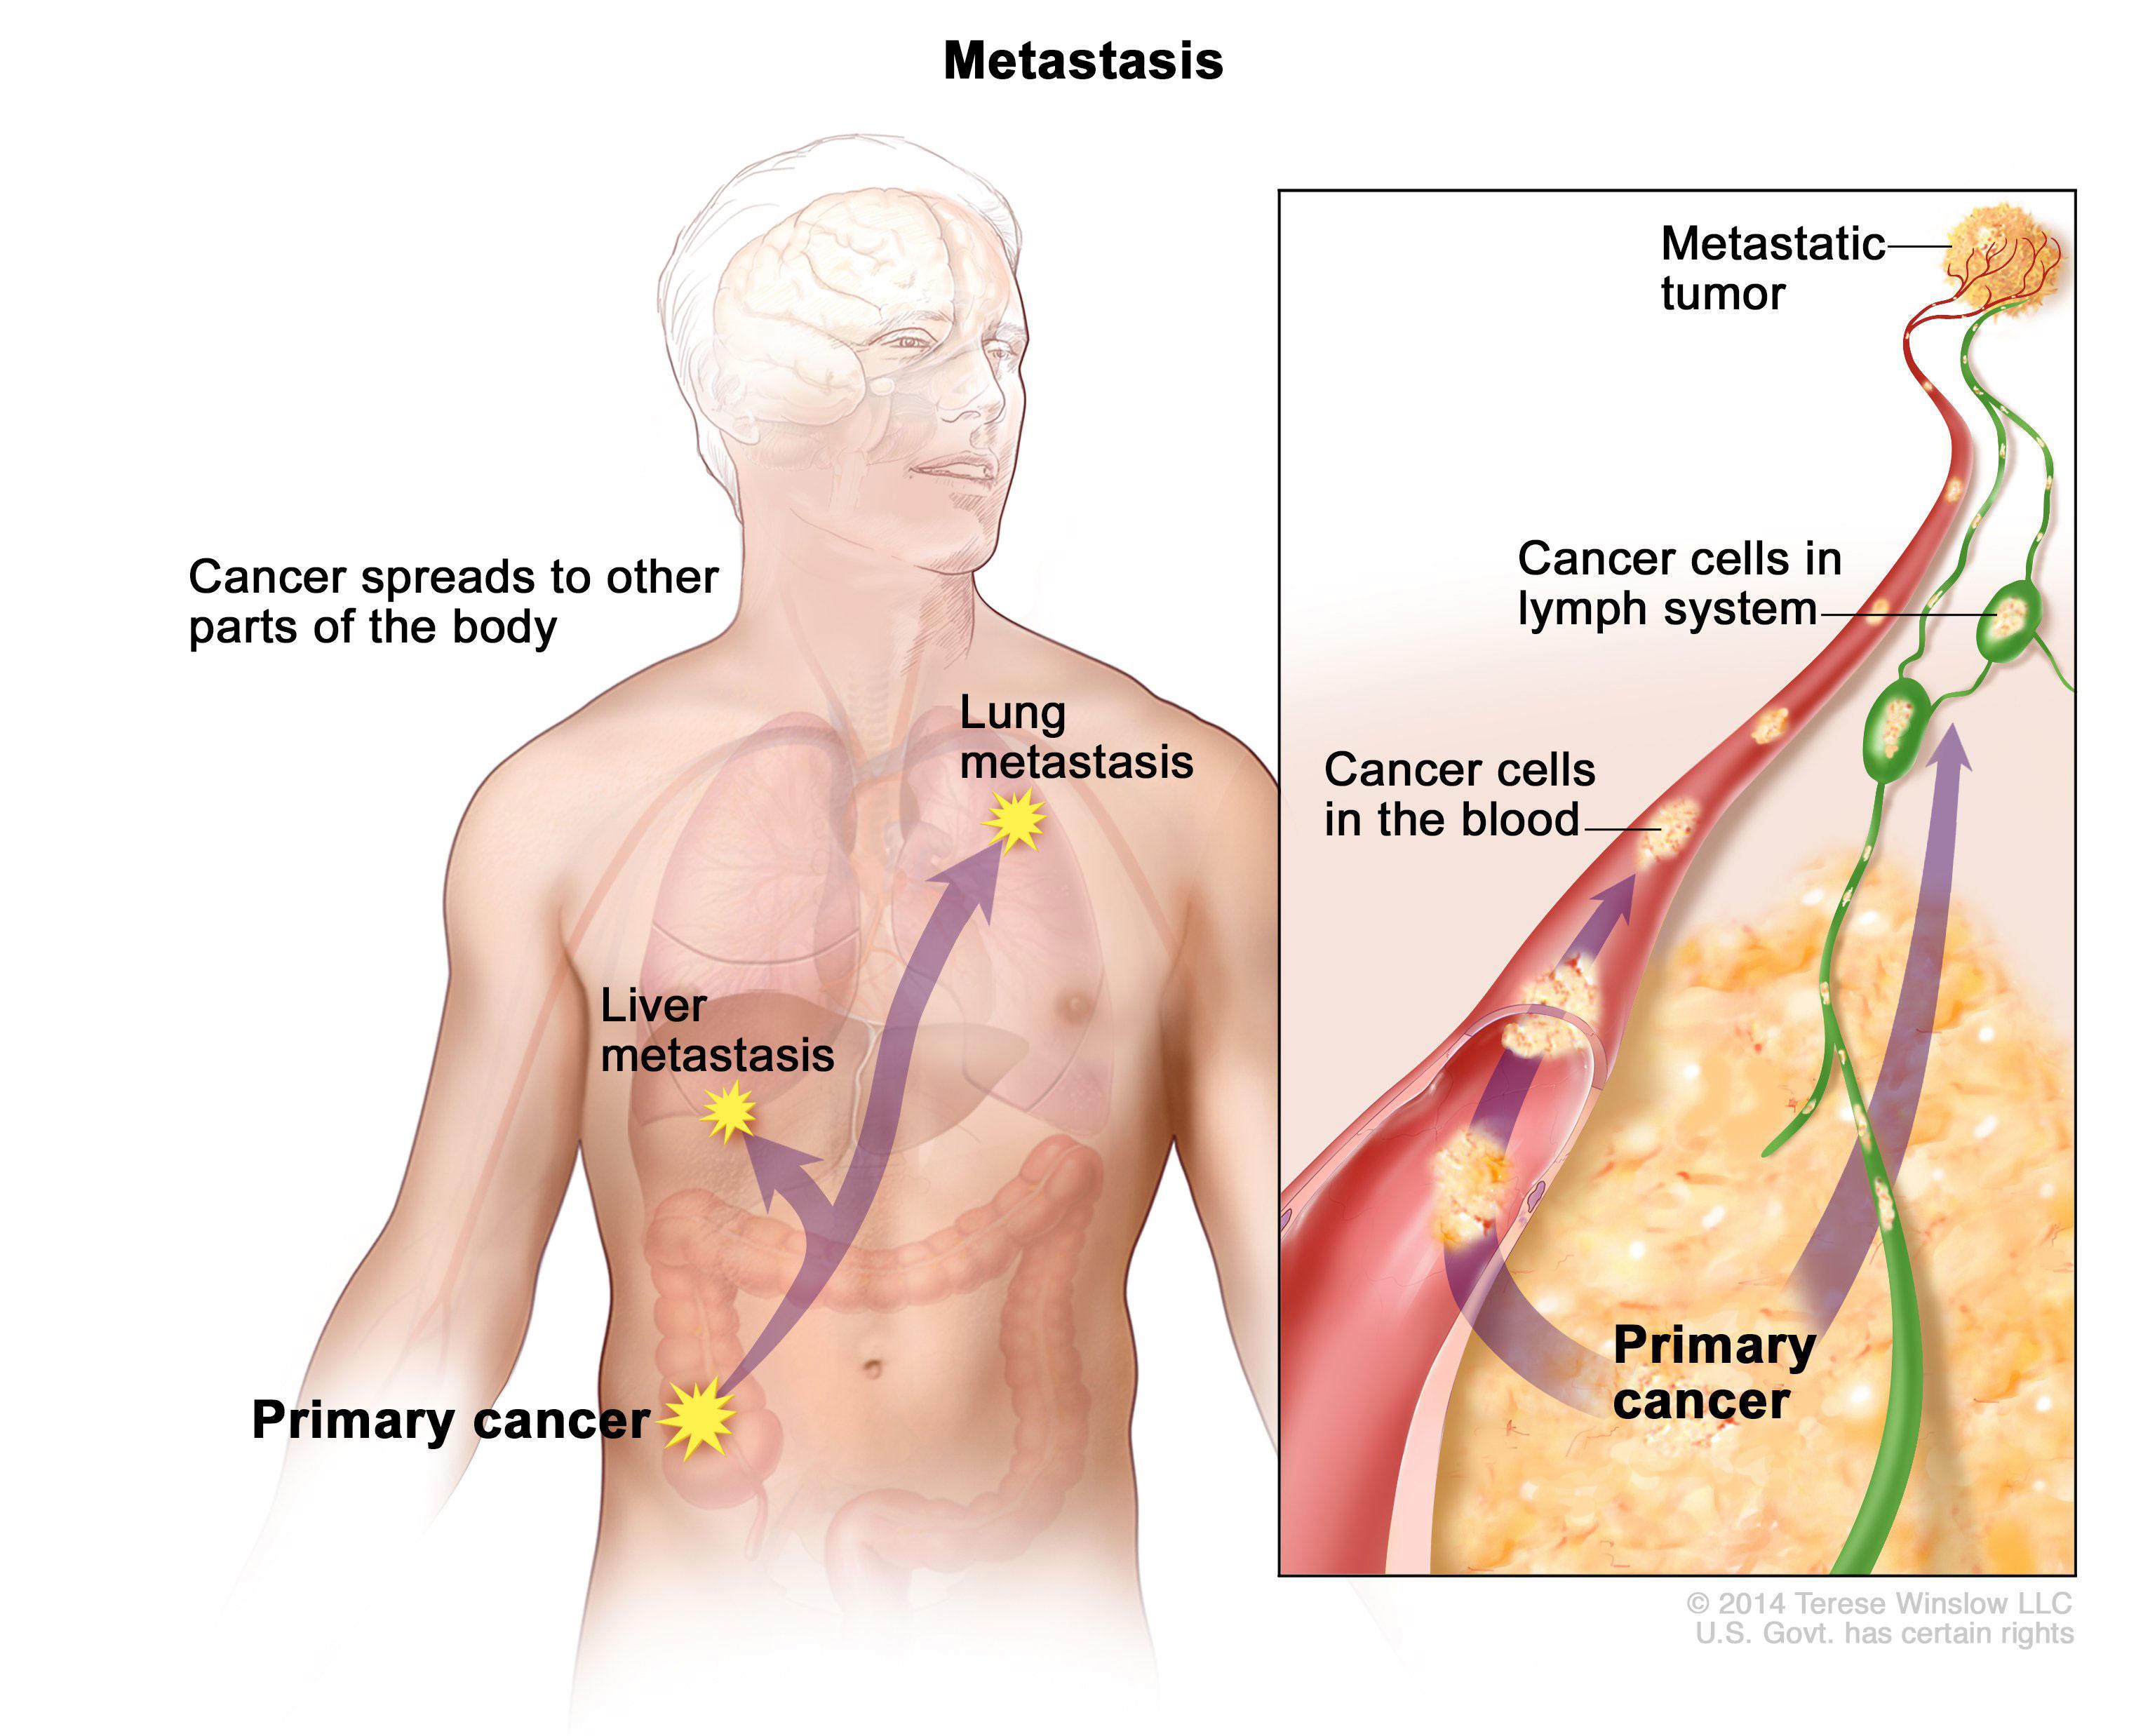 metastatic cancer causes human papillomaviruses and carcinogenesis well-established and novel models